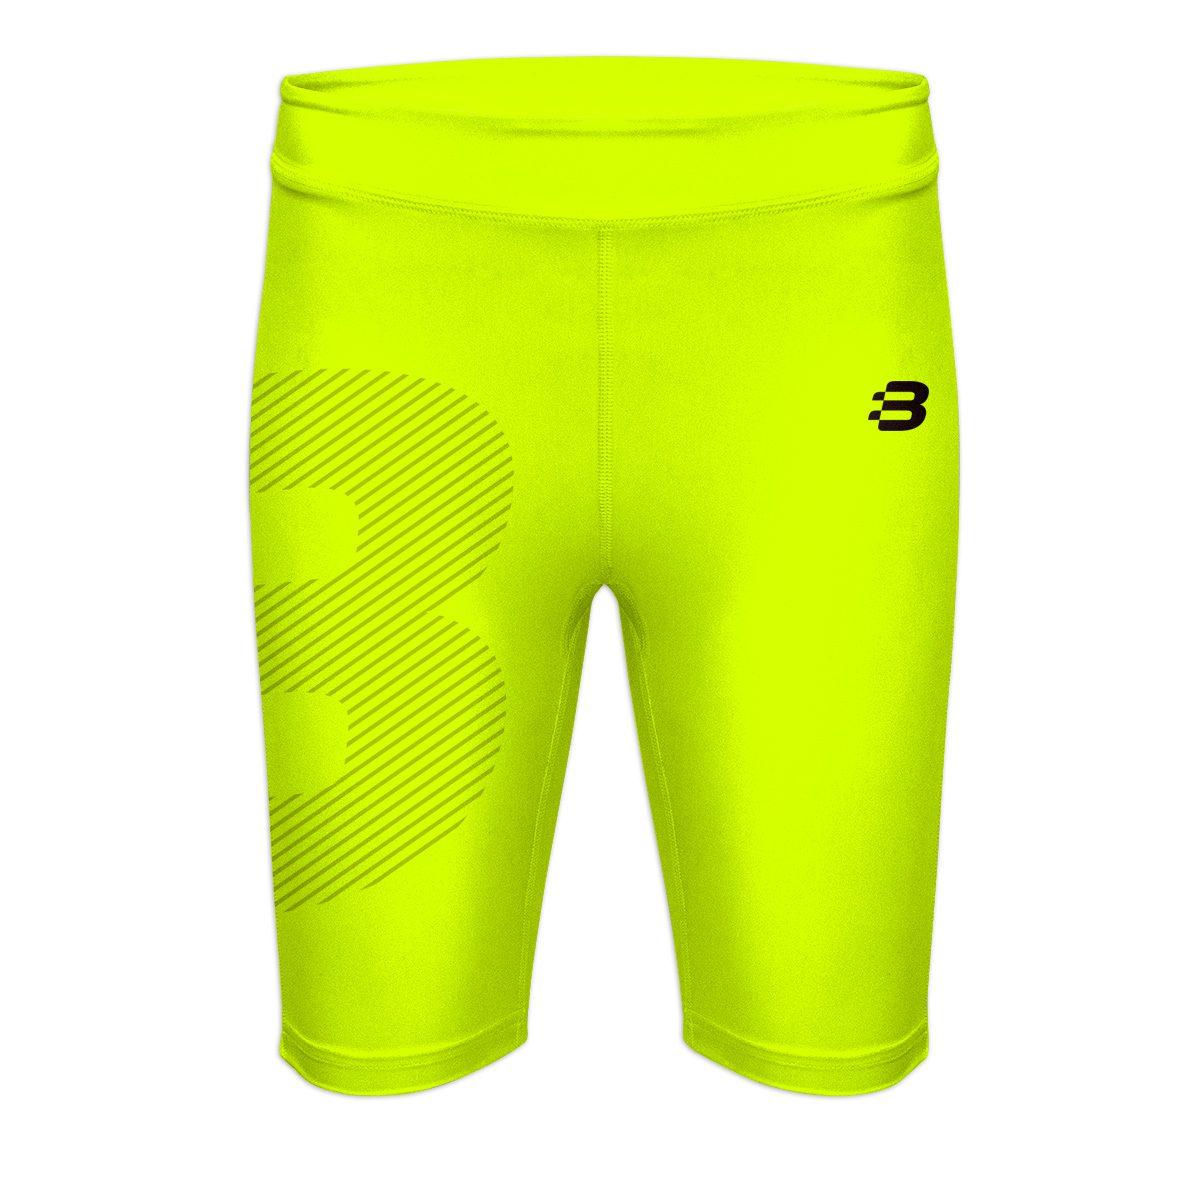 Ladies Compression Shorts - Fluoro Yellow